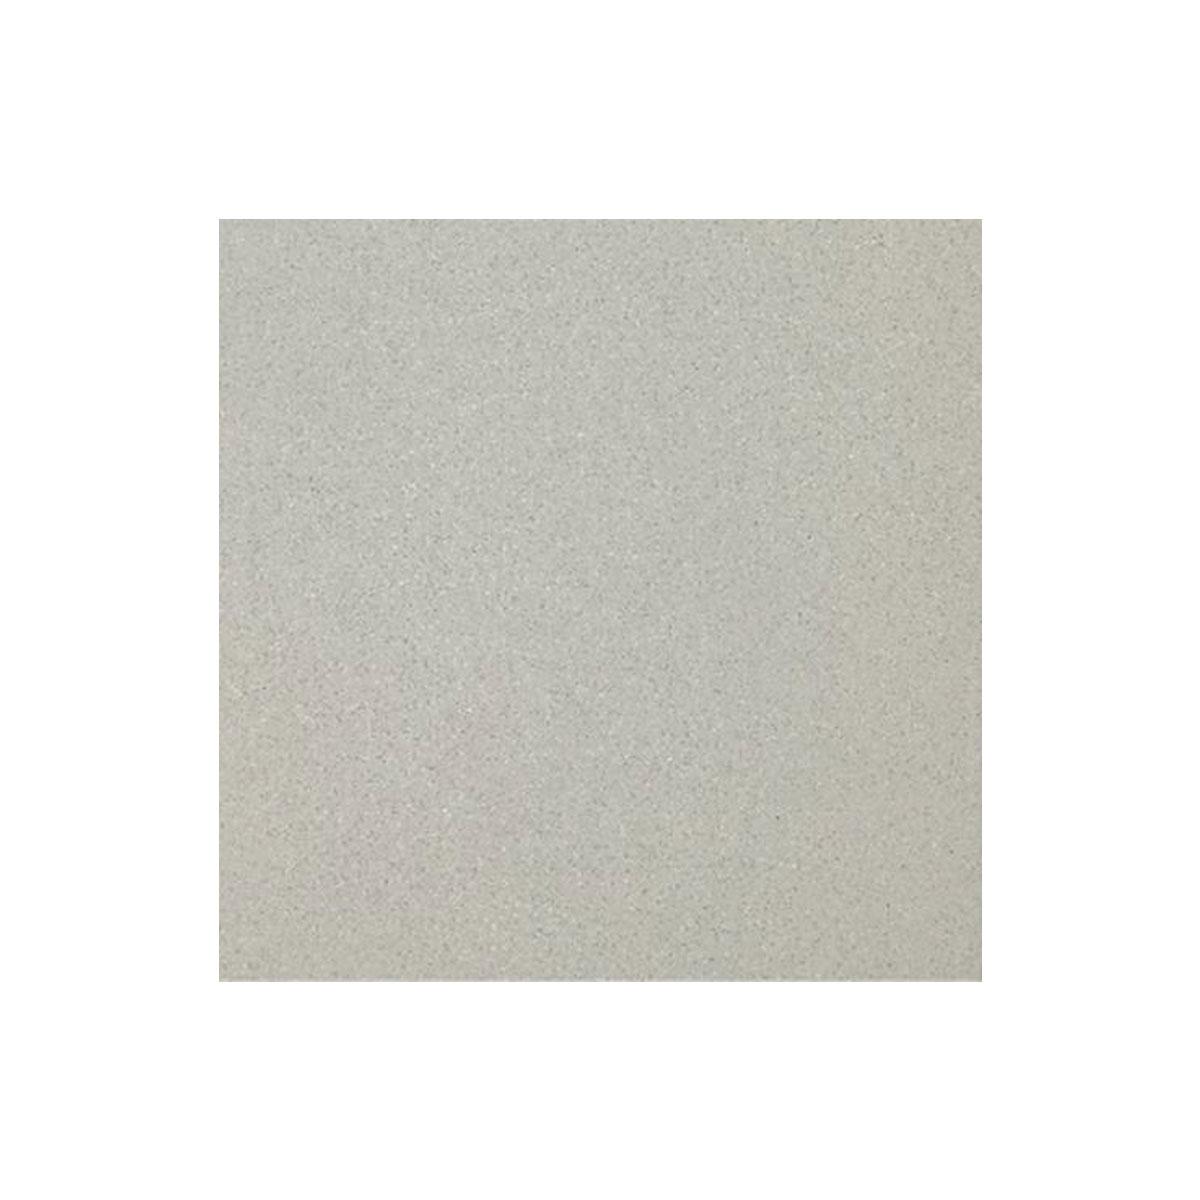 Patio - Ivory - Commercial Range Tiles